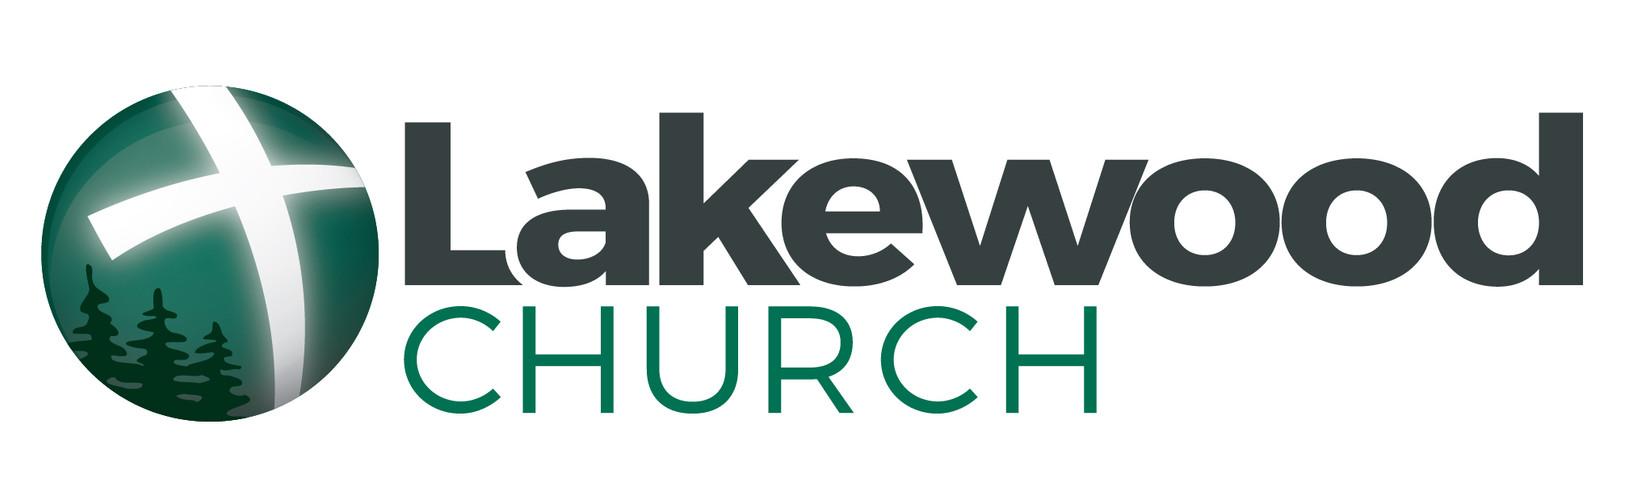 lakewood_logo_noreflect.jpg